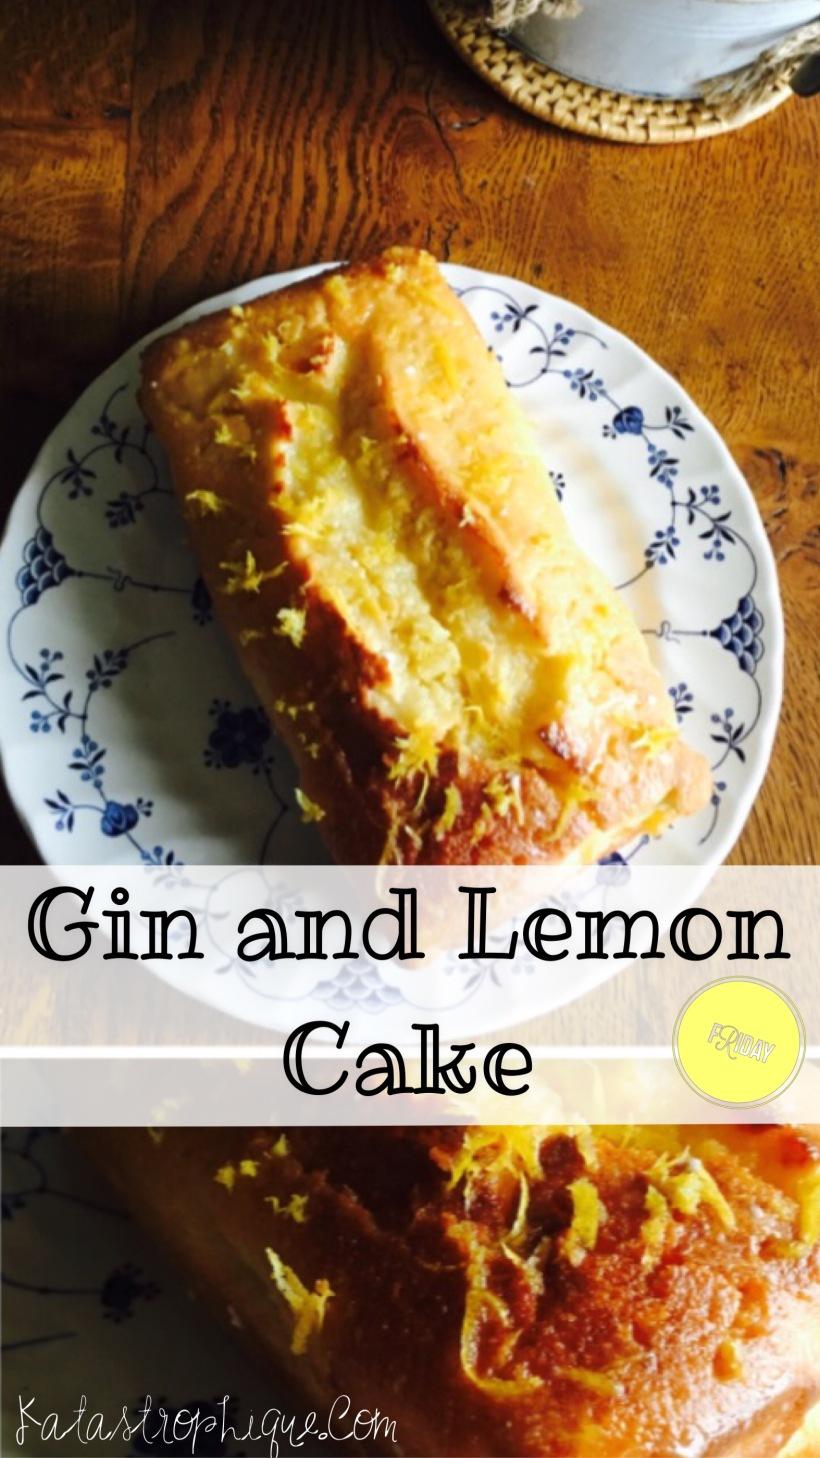 gin and lemon cake, gin, lemon, lemon drizzle, cake, baking